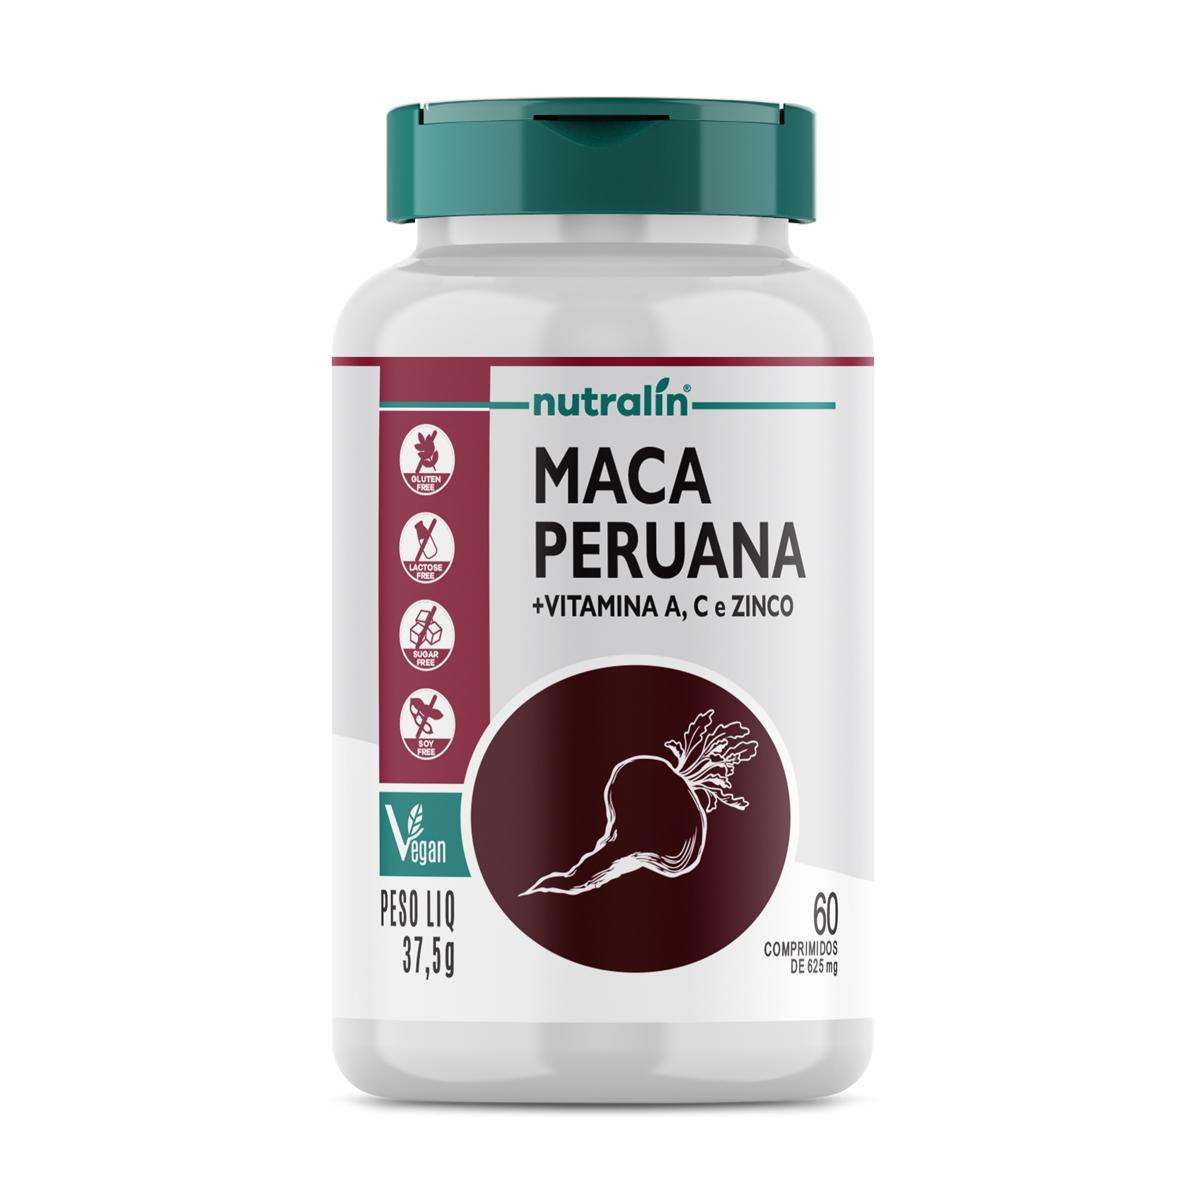 Maca Peruana Suplemento Nutralin 60 Caps. 625mg